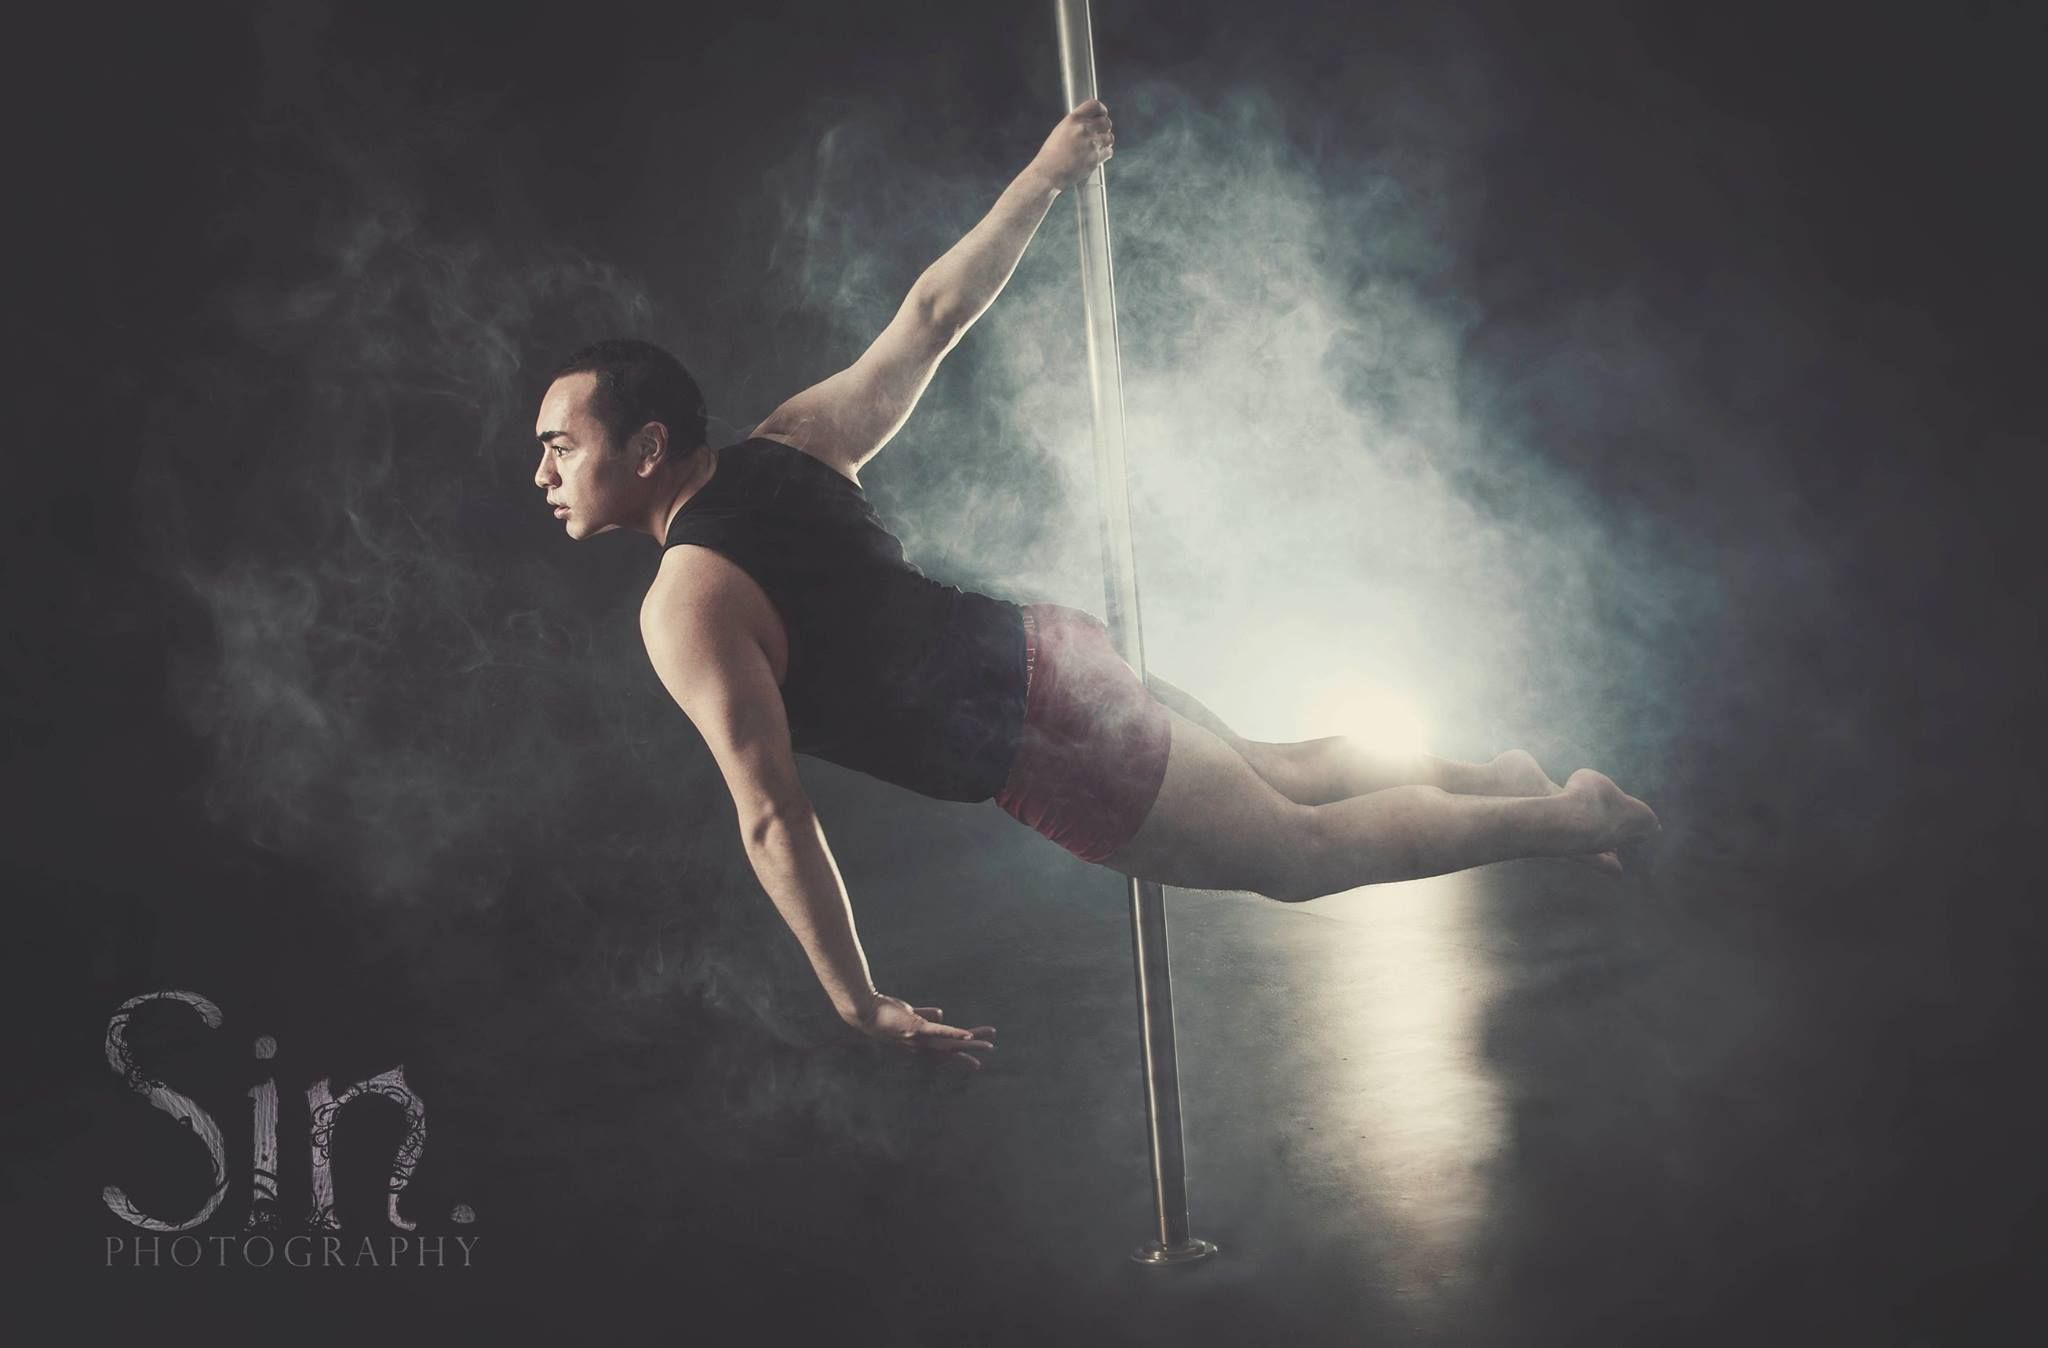 Male Pole Dancing Sin graphy Male pole